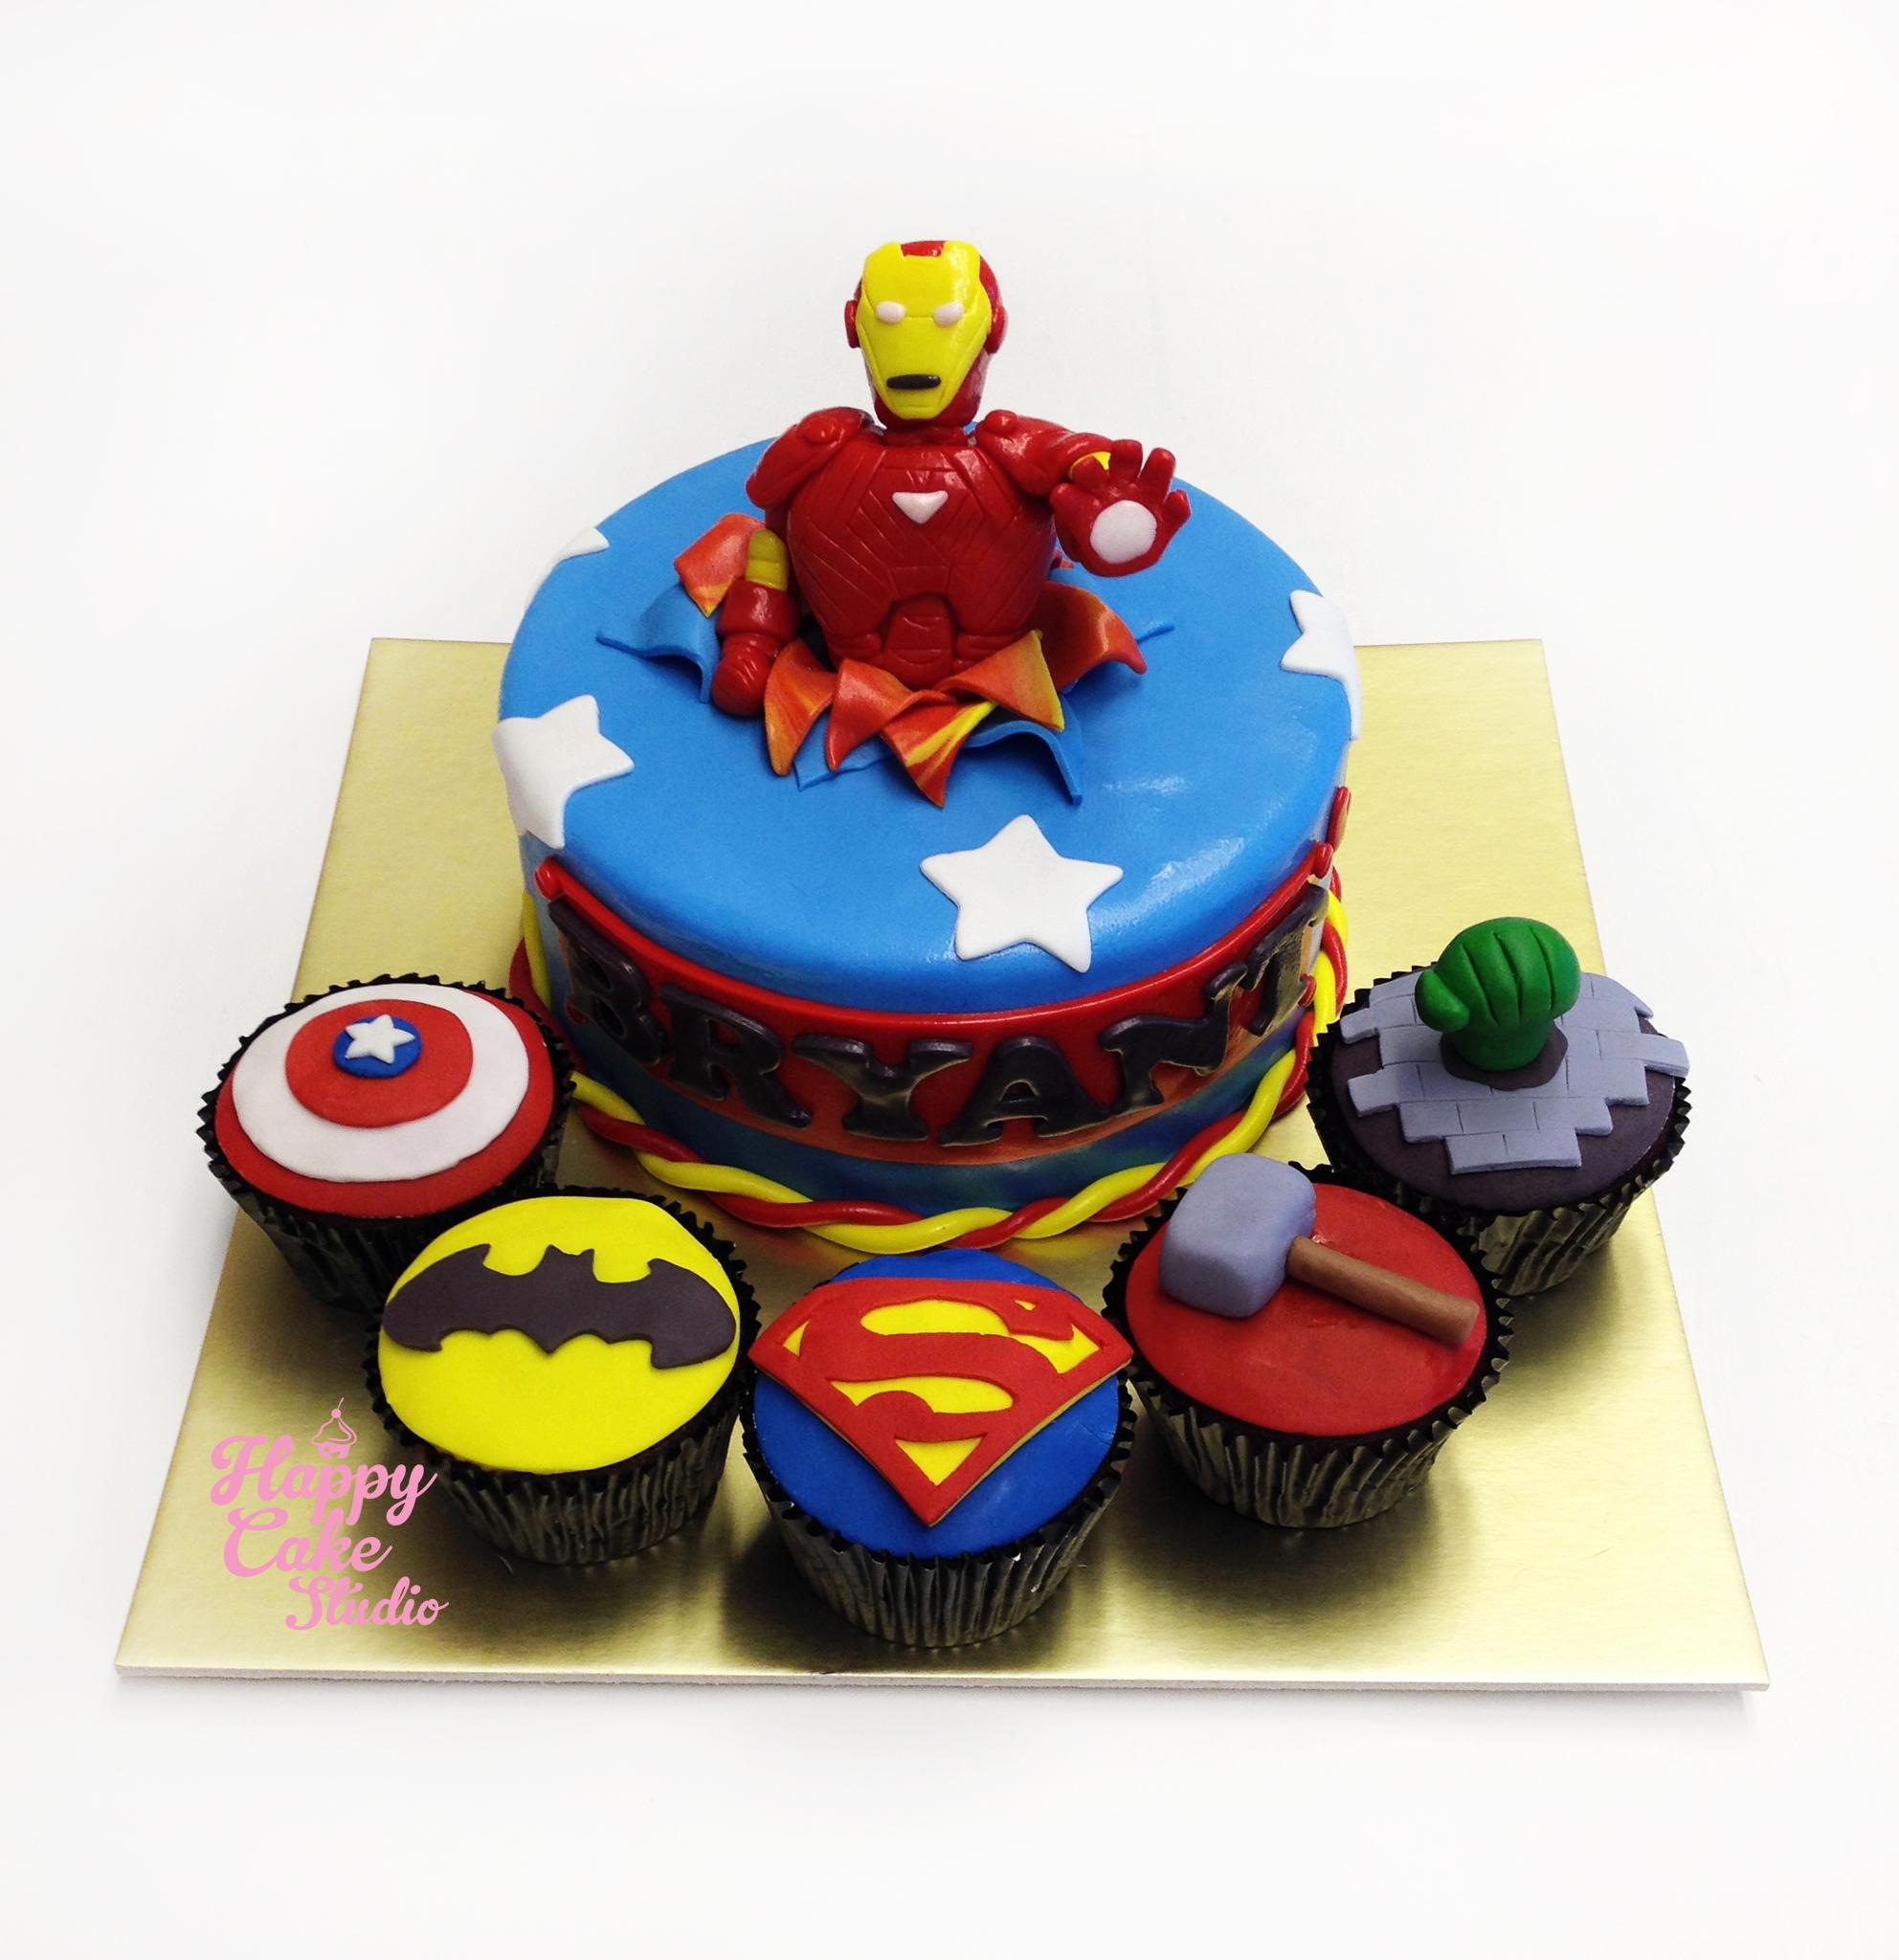 12 Iron Man And Batman Birthday Cakes Photo Batman And Iron Man